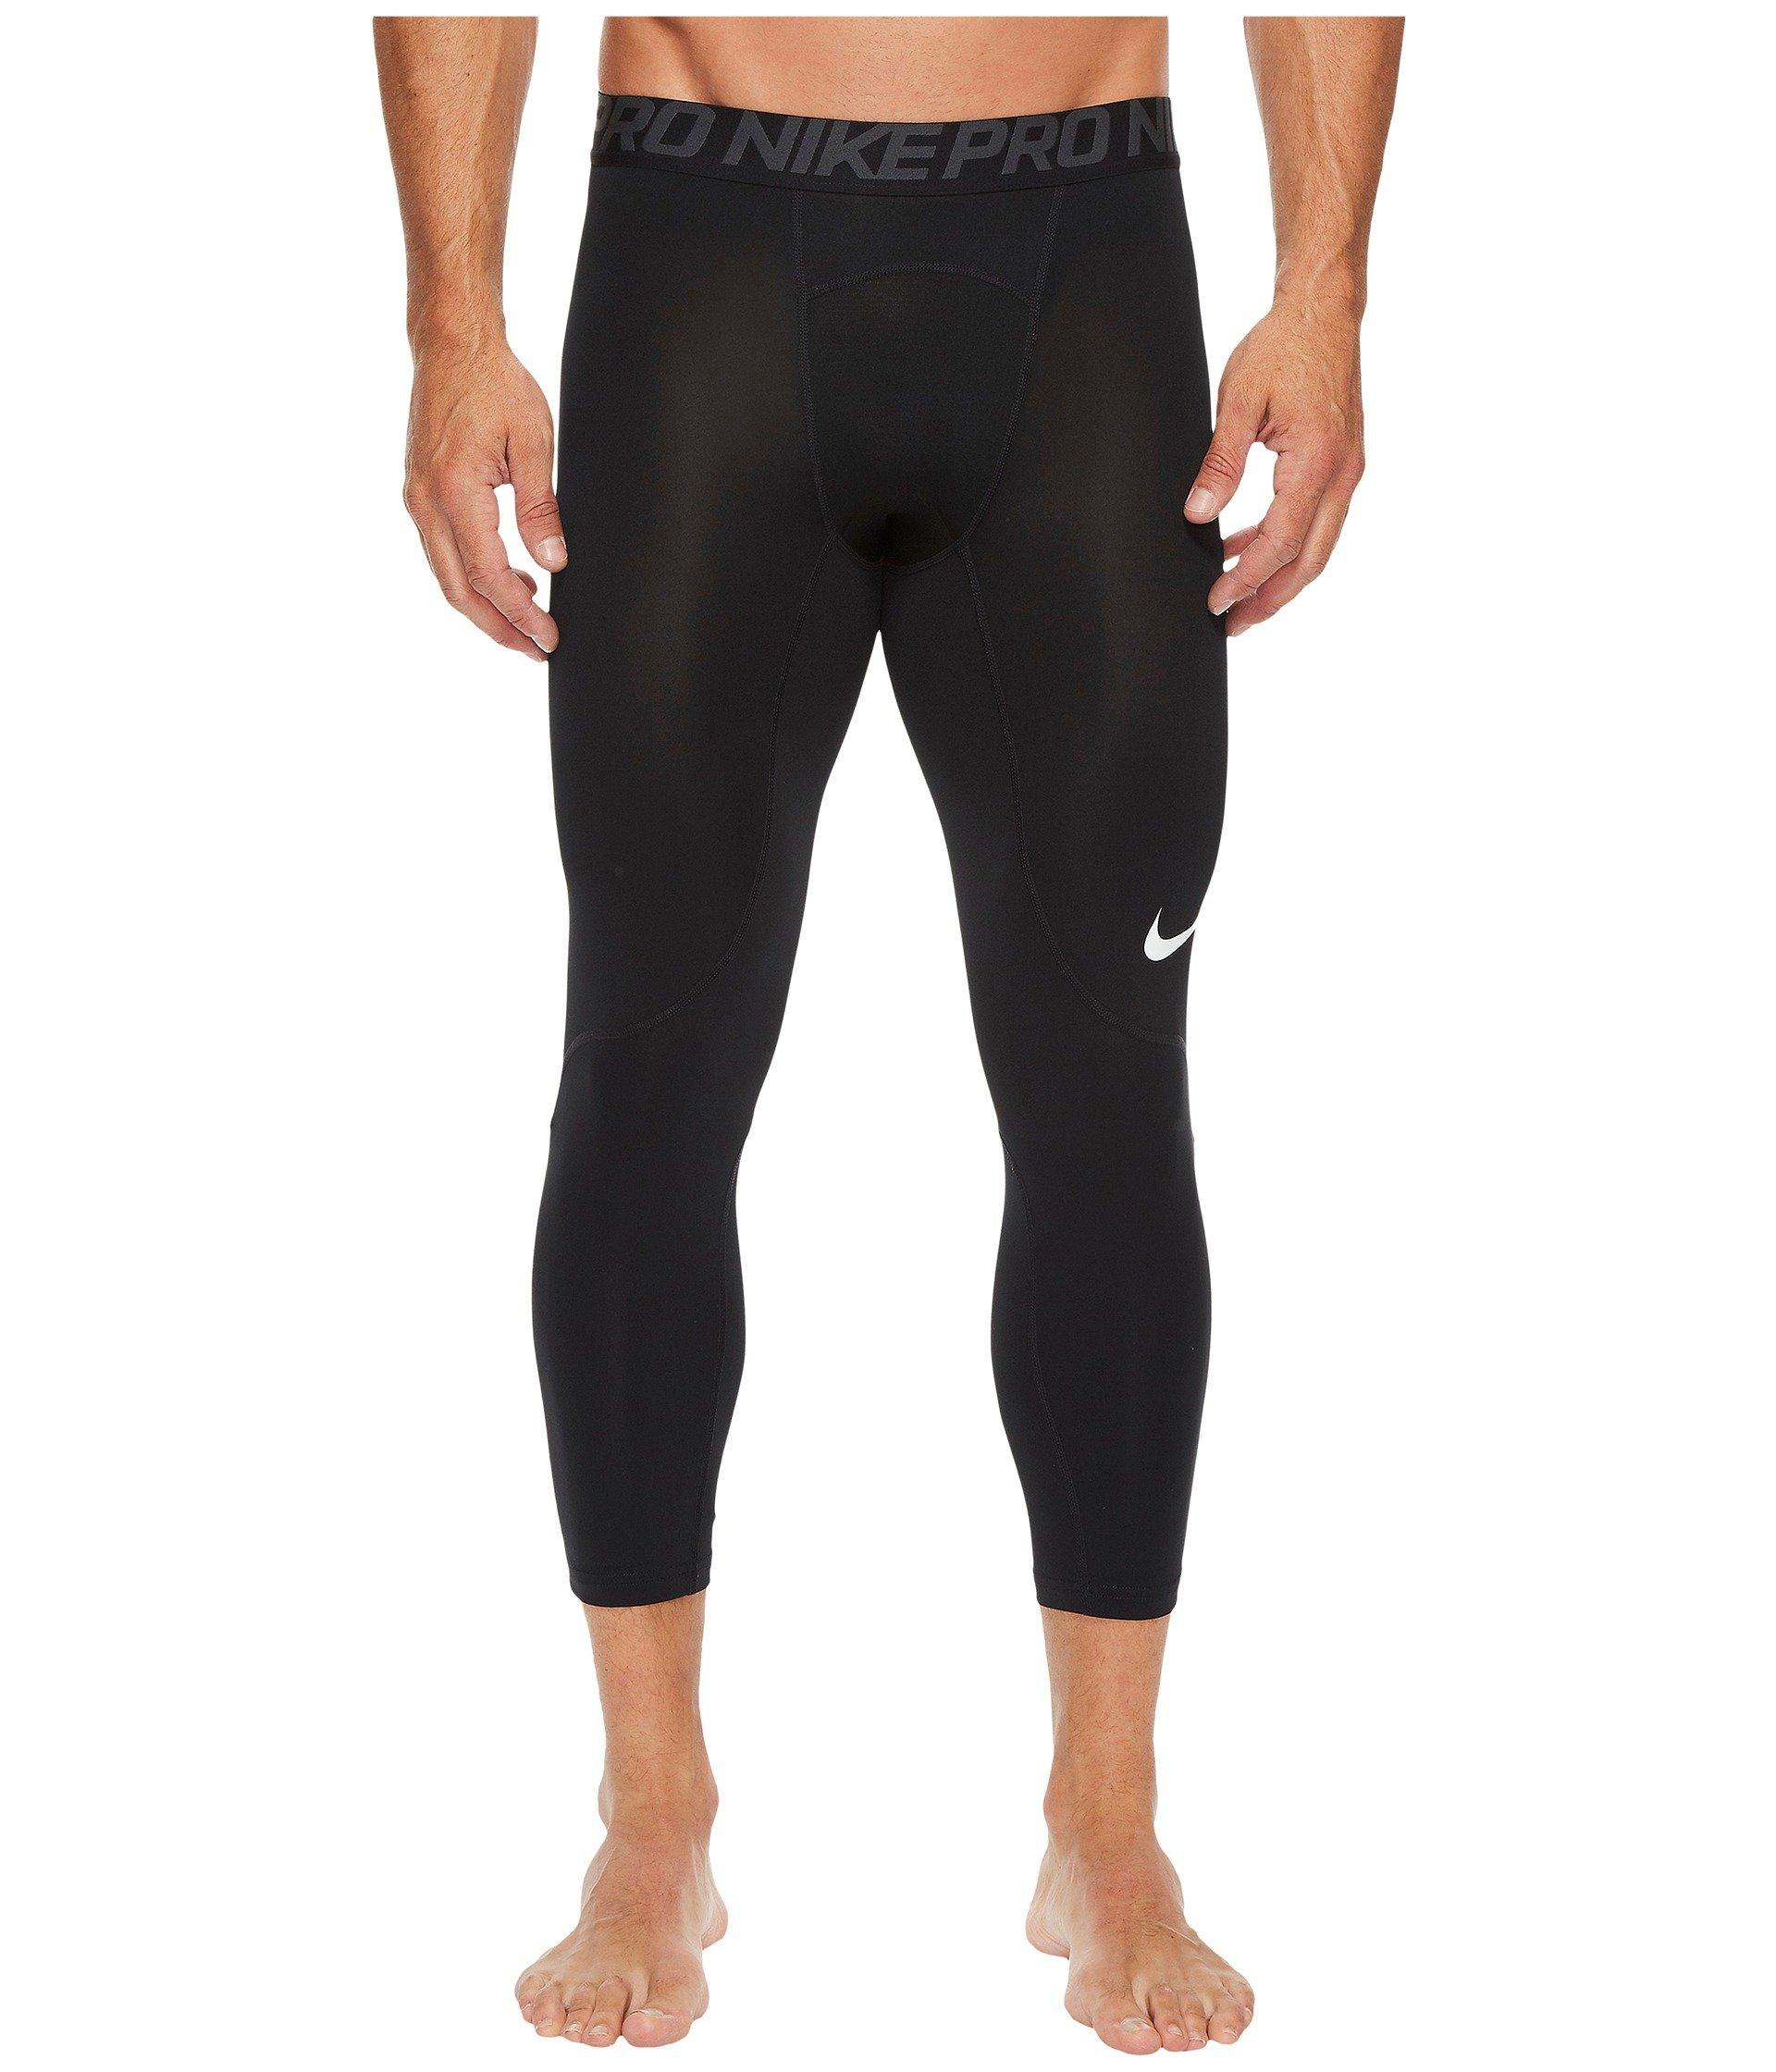 7f426561b91cd Lyst - Nike Pro 3/4 Tight in Black for Men